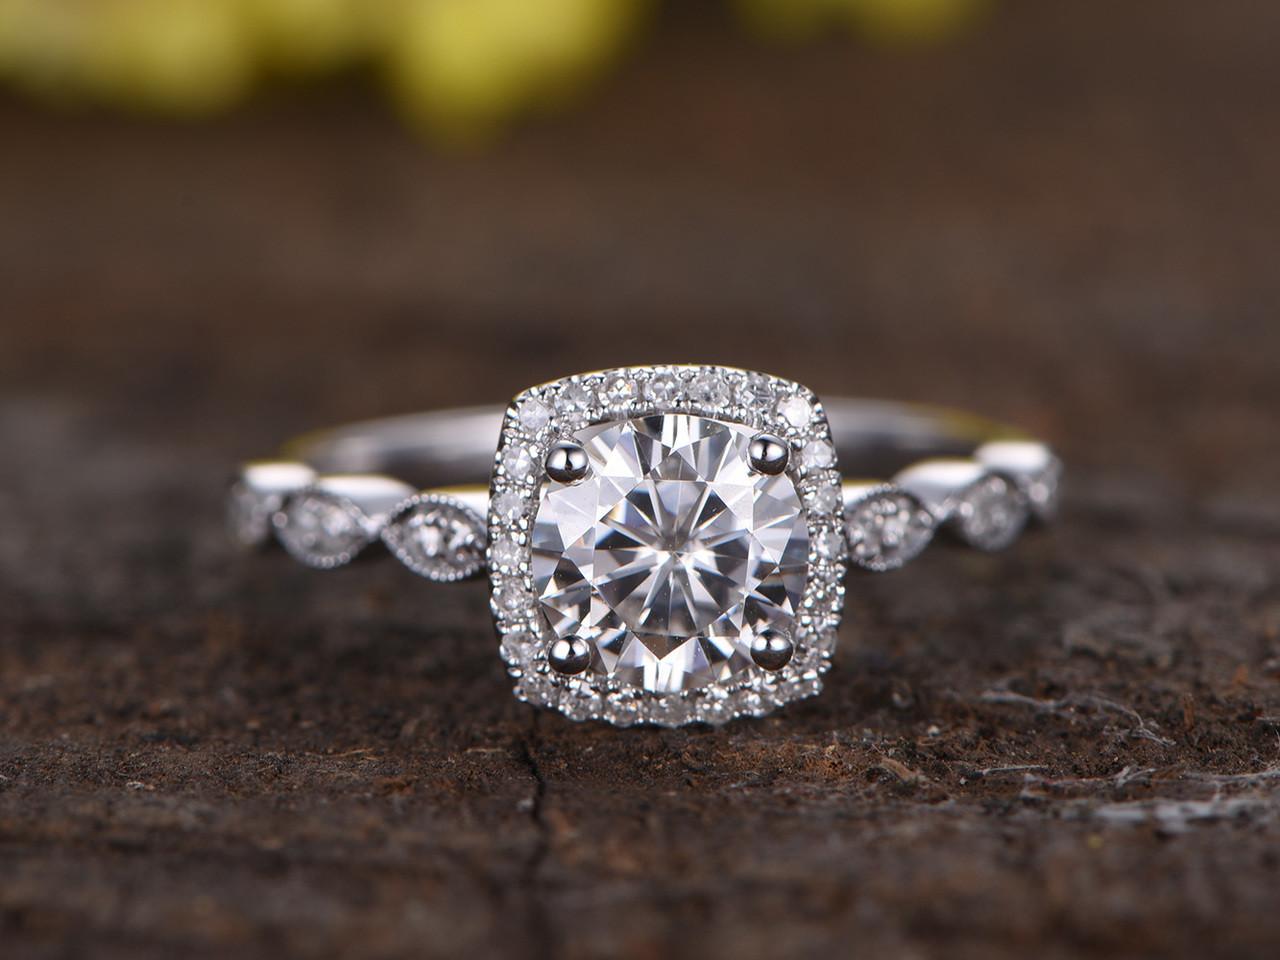 Antique Diamond Engagement Rings S